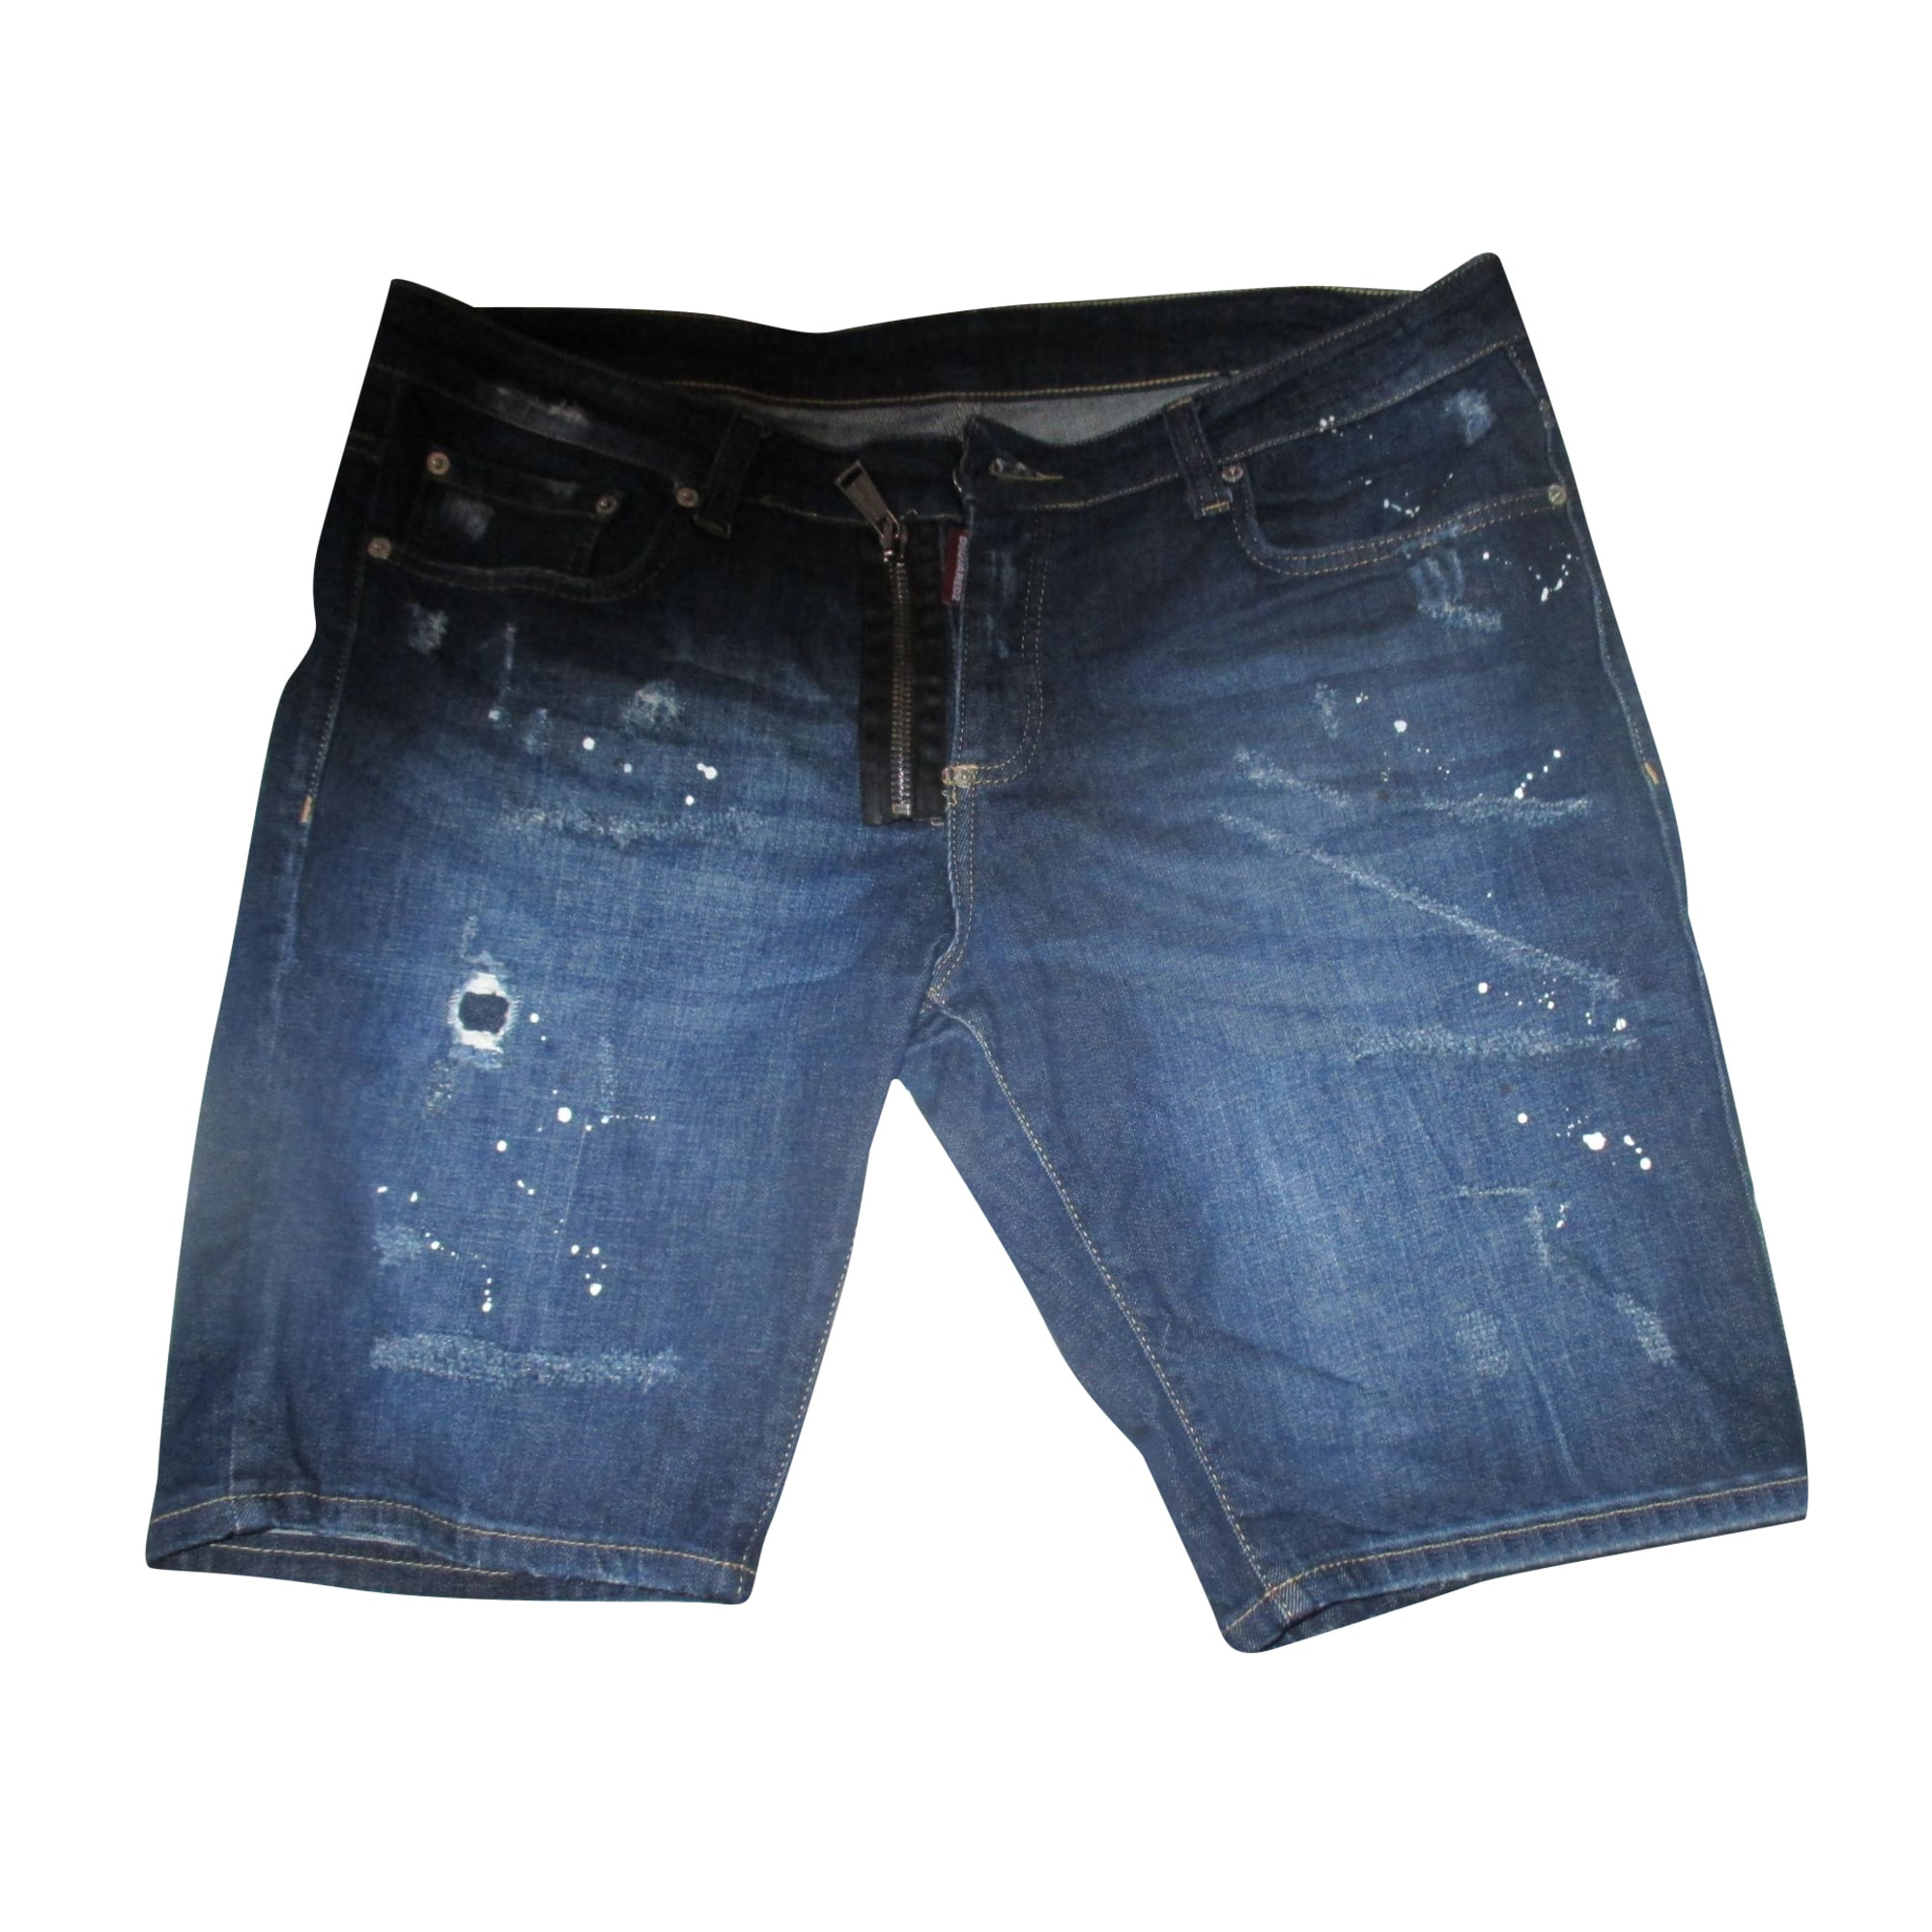 Bermuda Shorts DSQUARED2 Blue, navy, turquoise